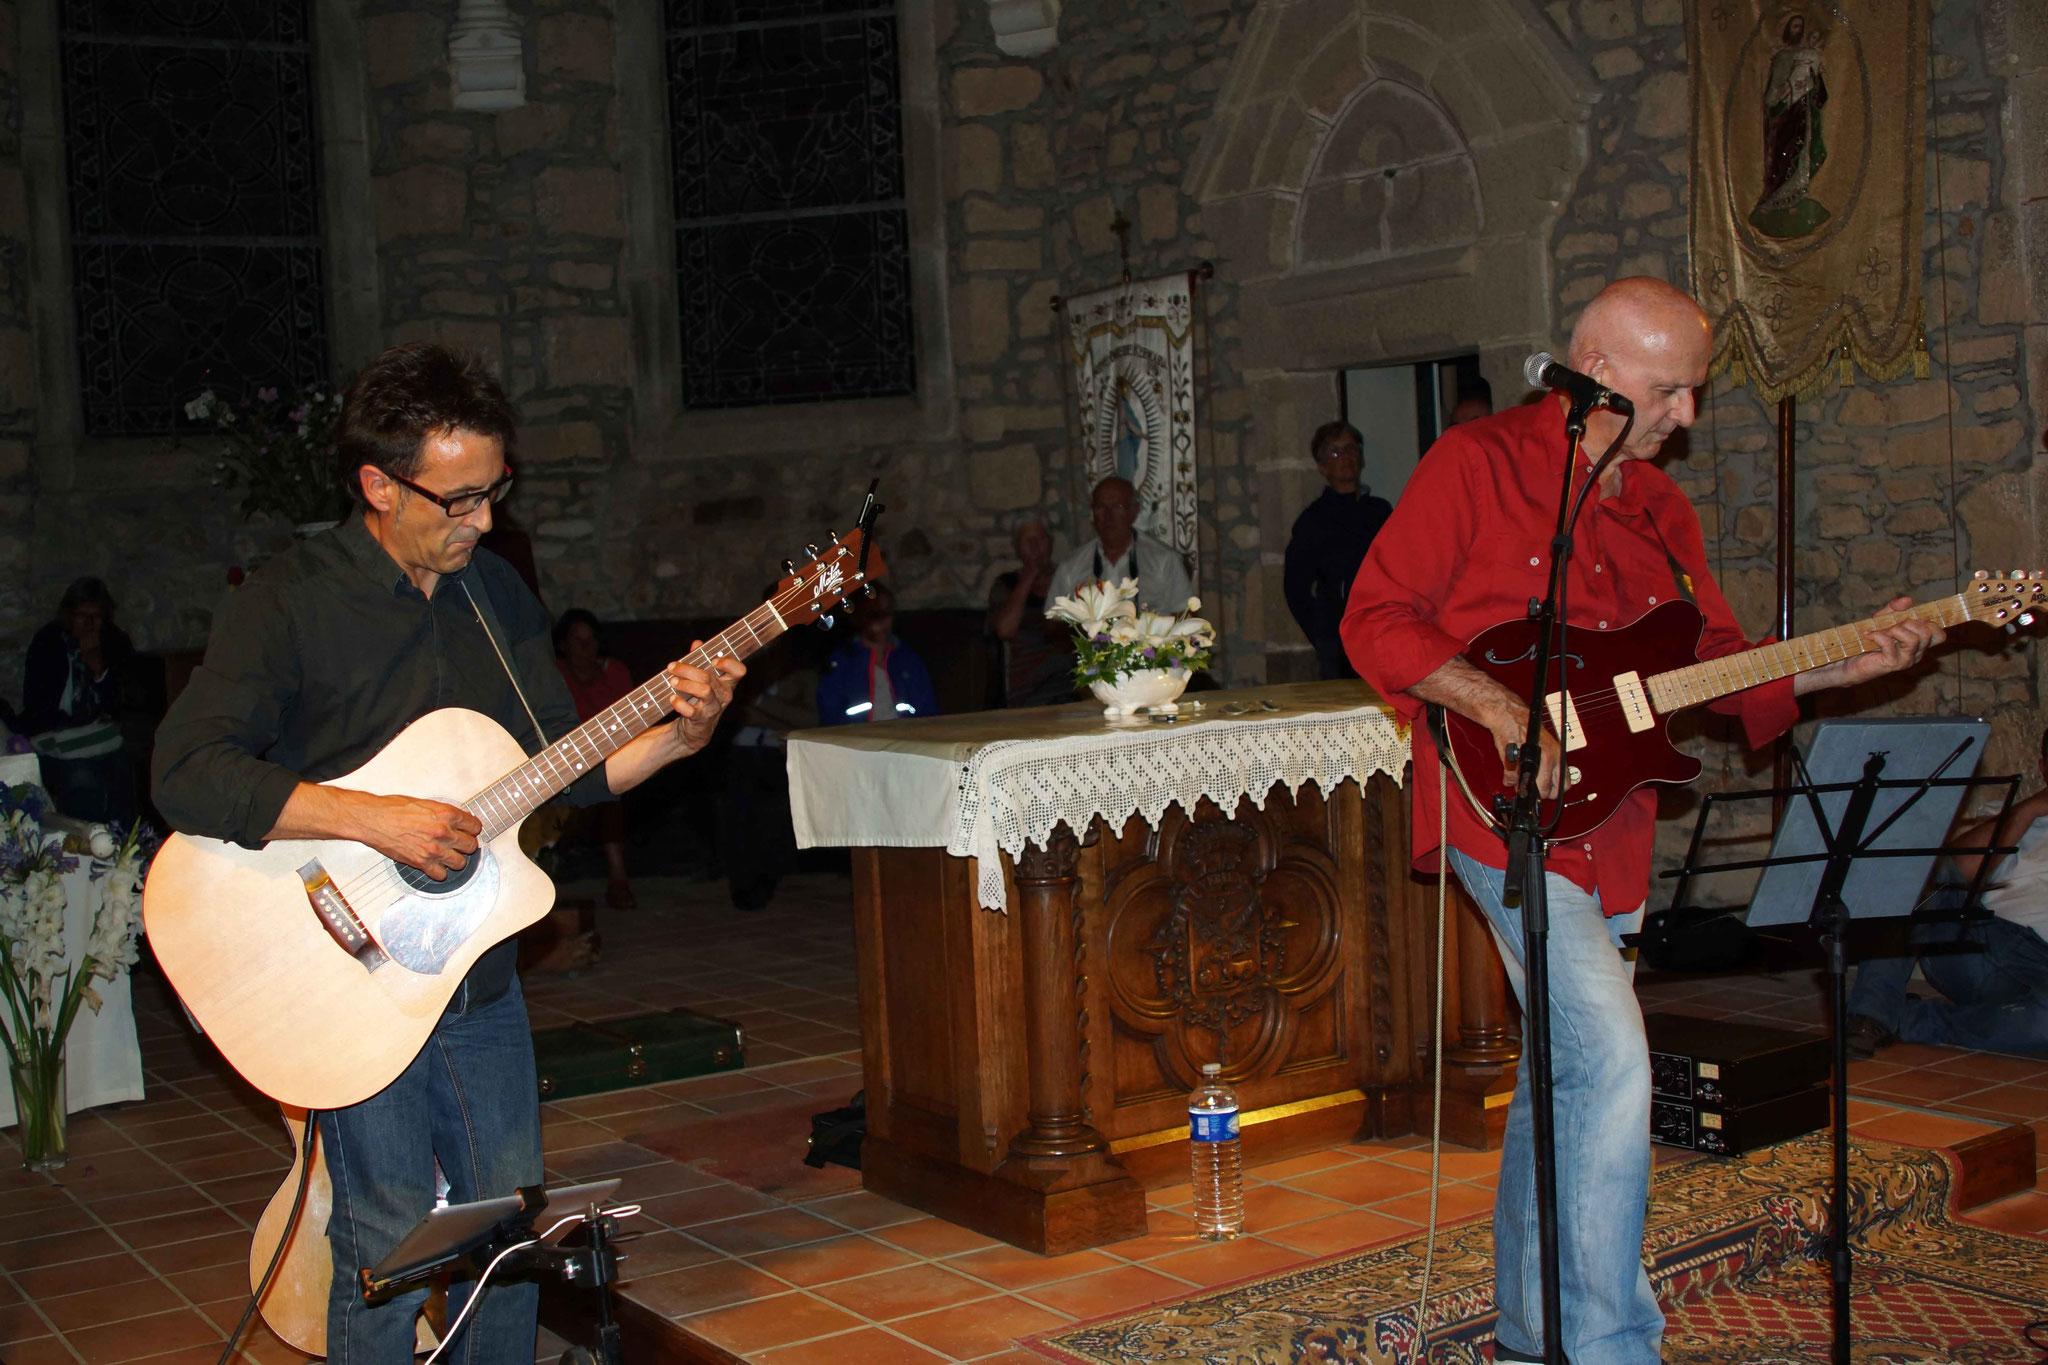 Concert de Kermaria Sulard, 28 août 2016 ; 5